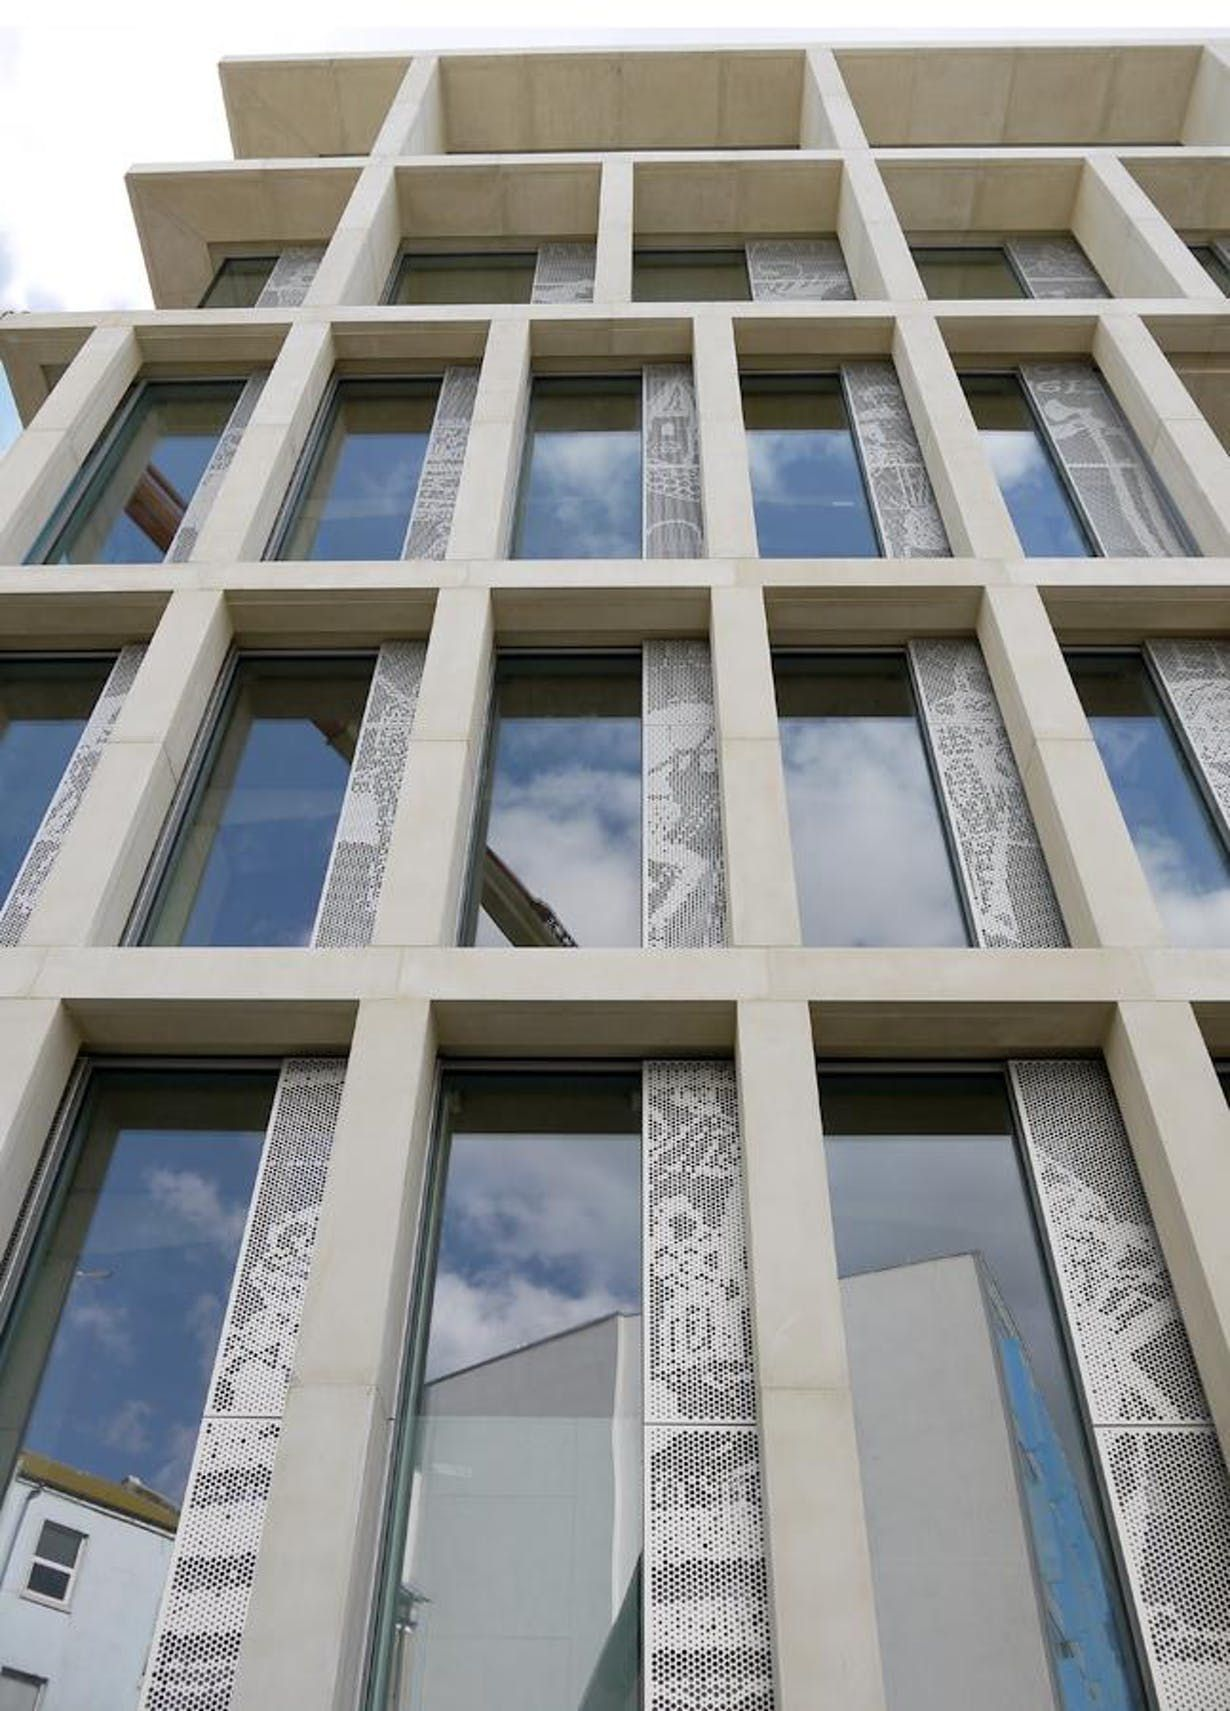 Uch2 University Of Brighton Proctor Matthews Architects